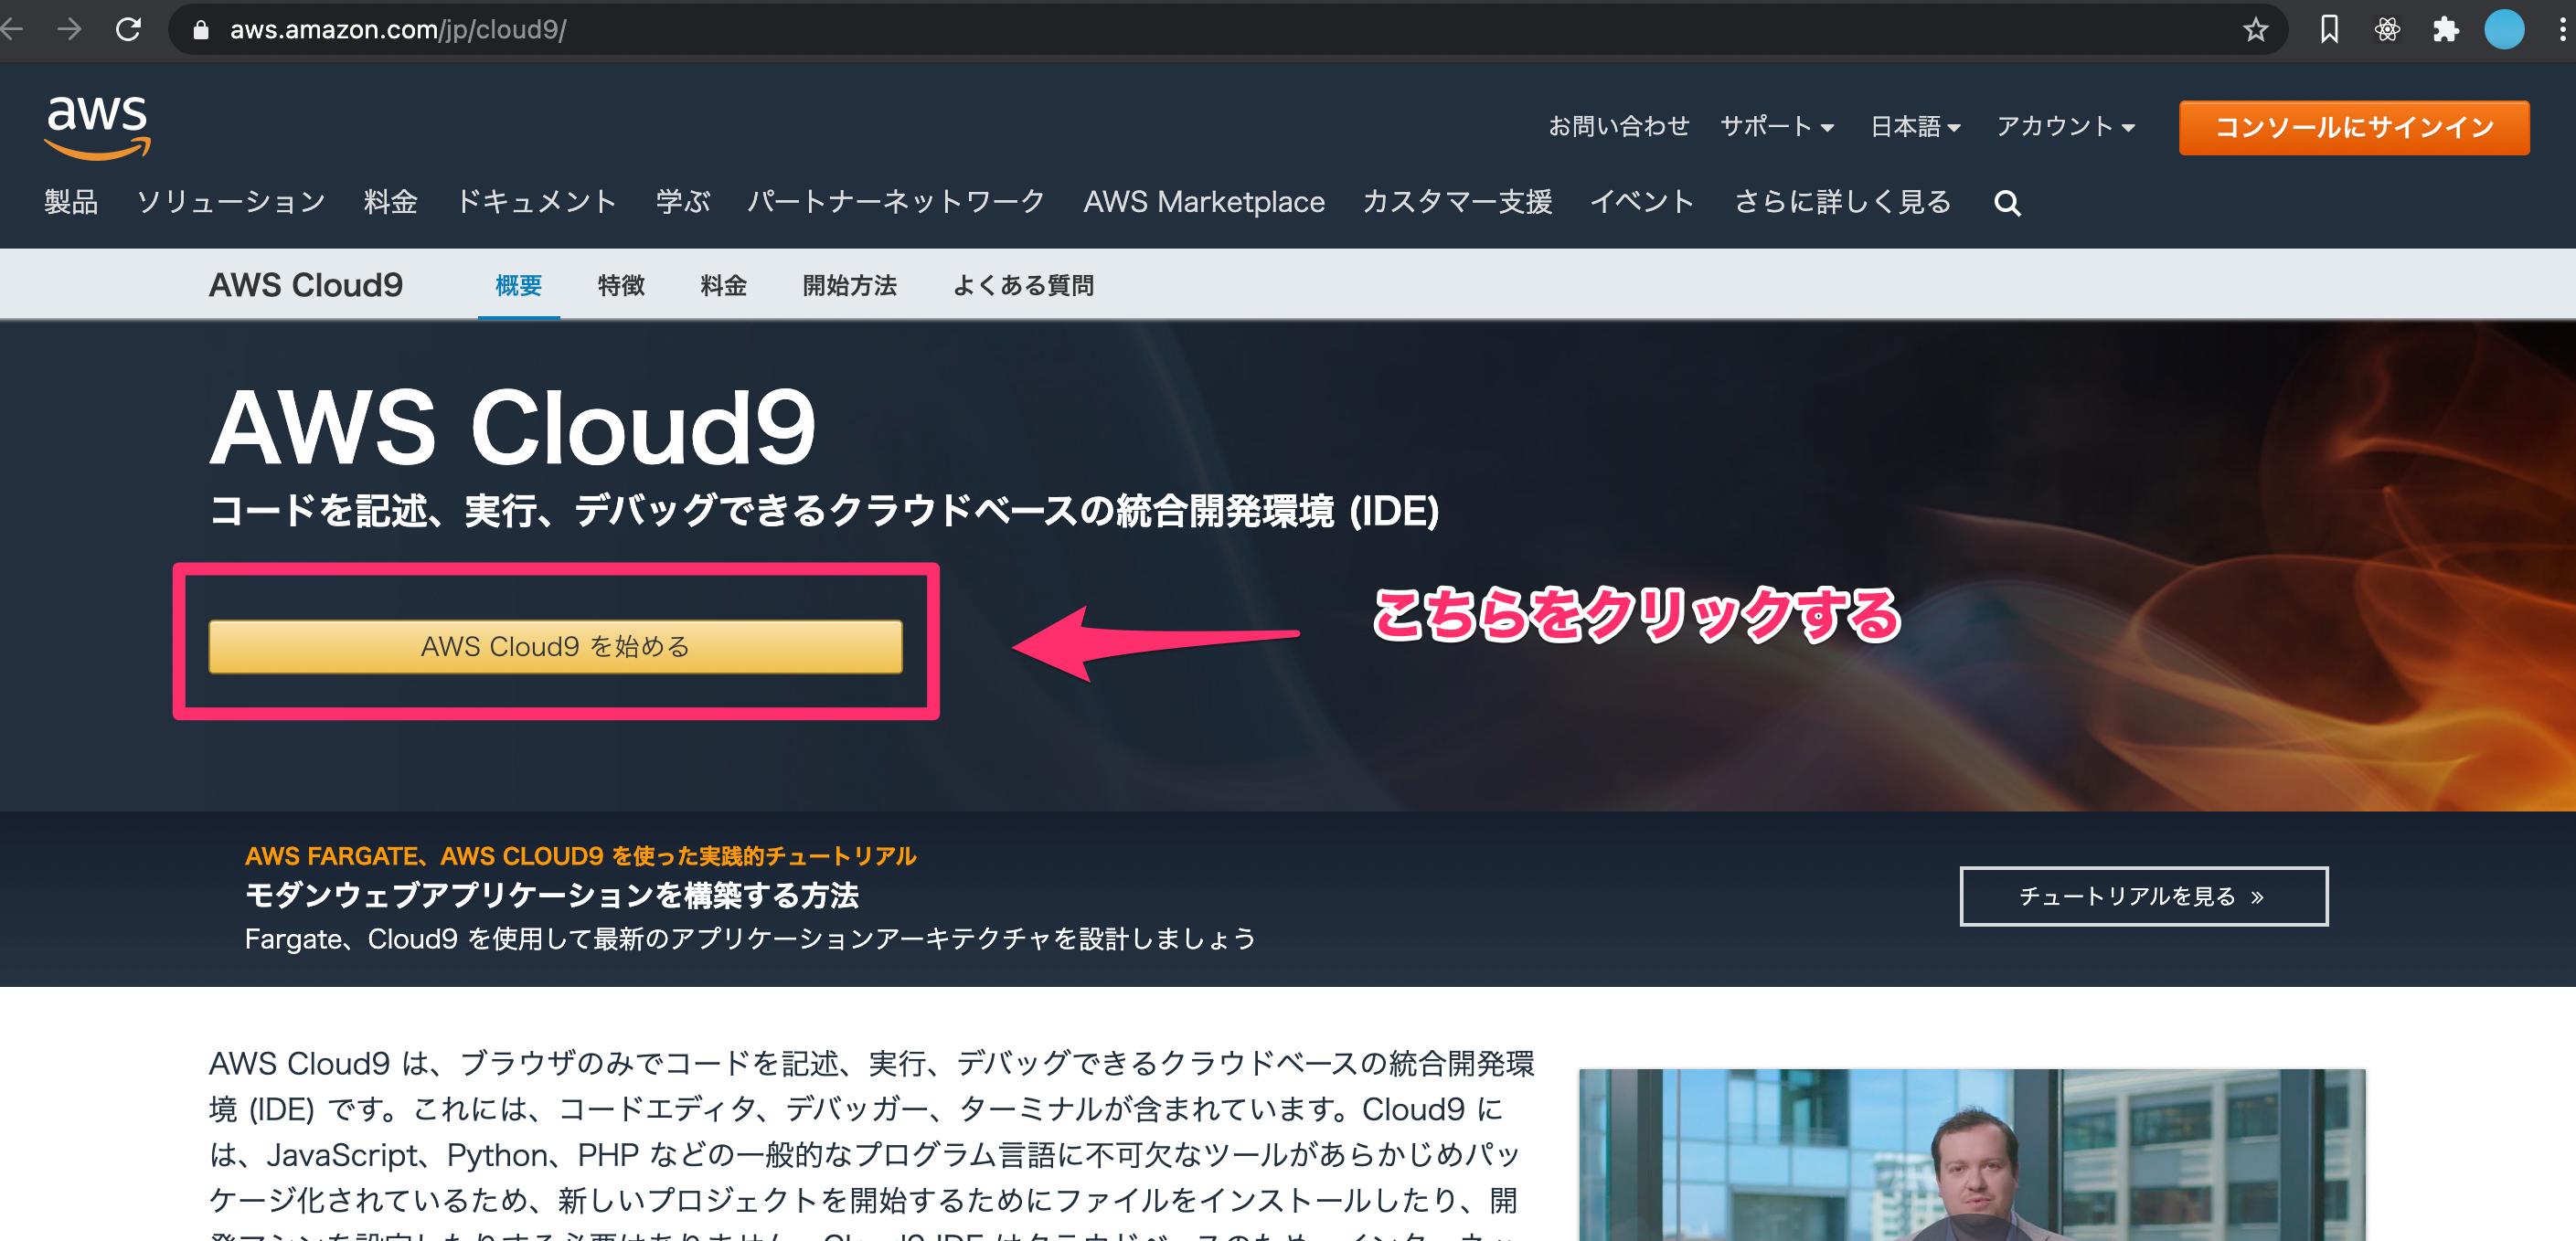 Cloud9のトップページ